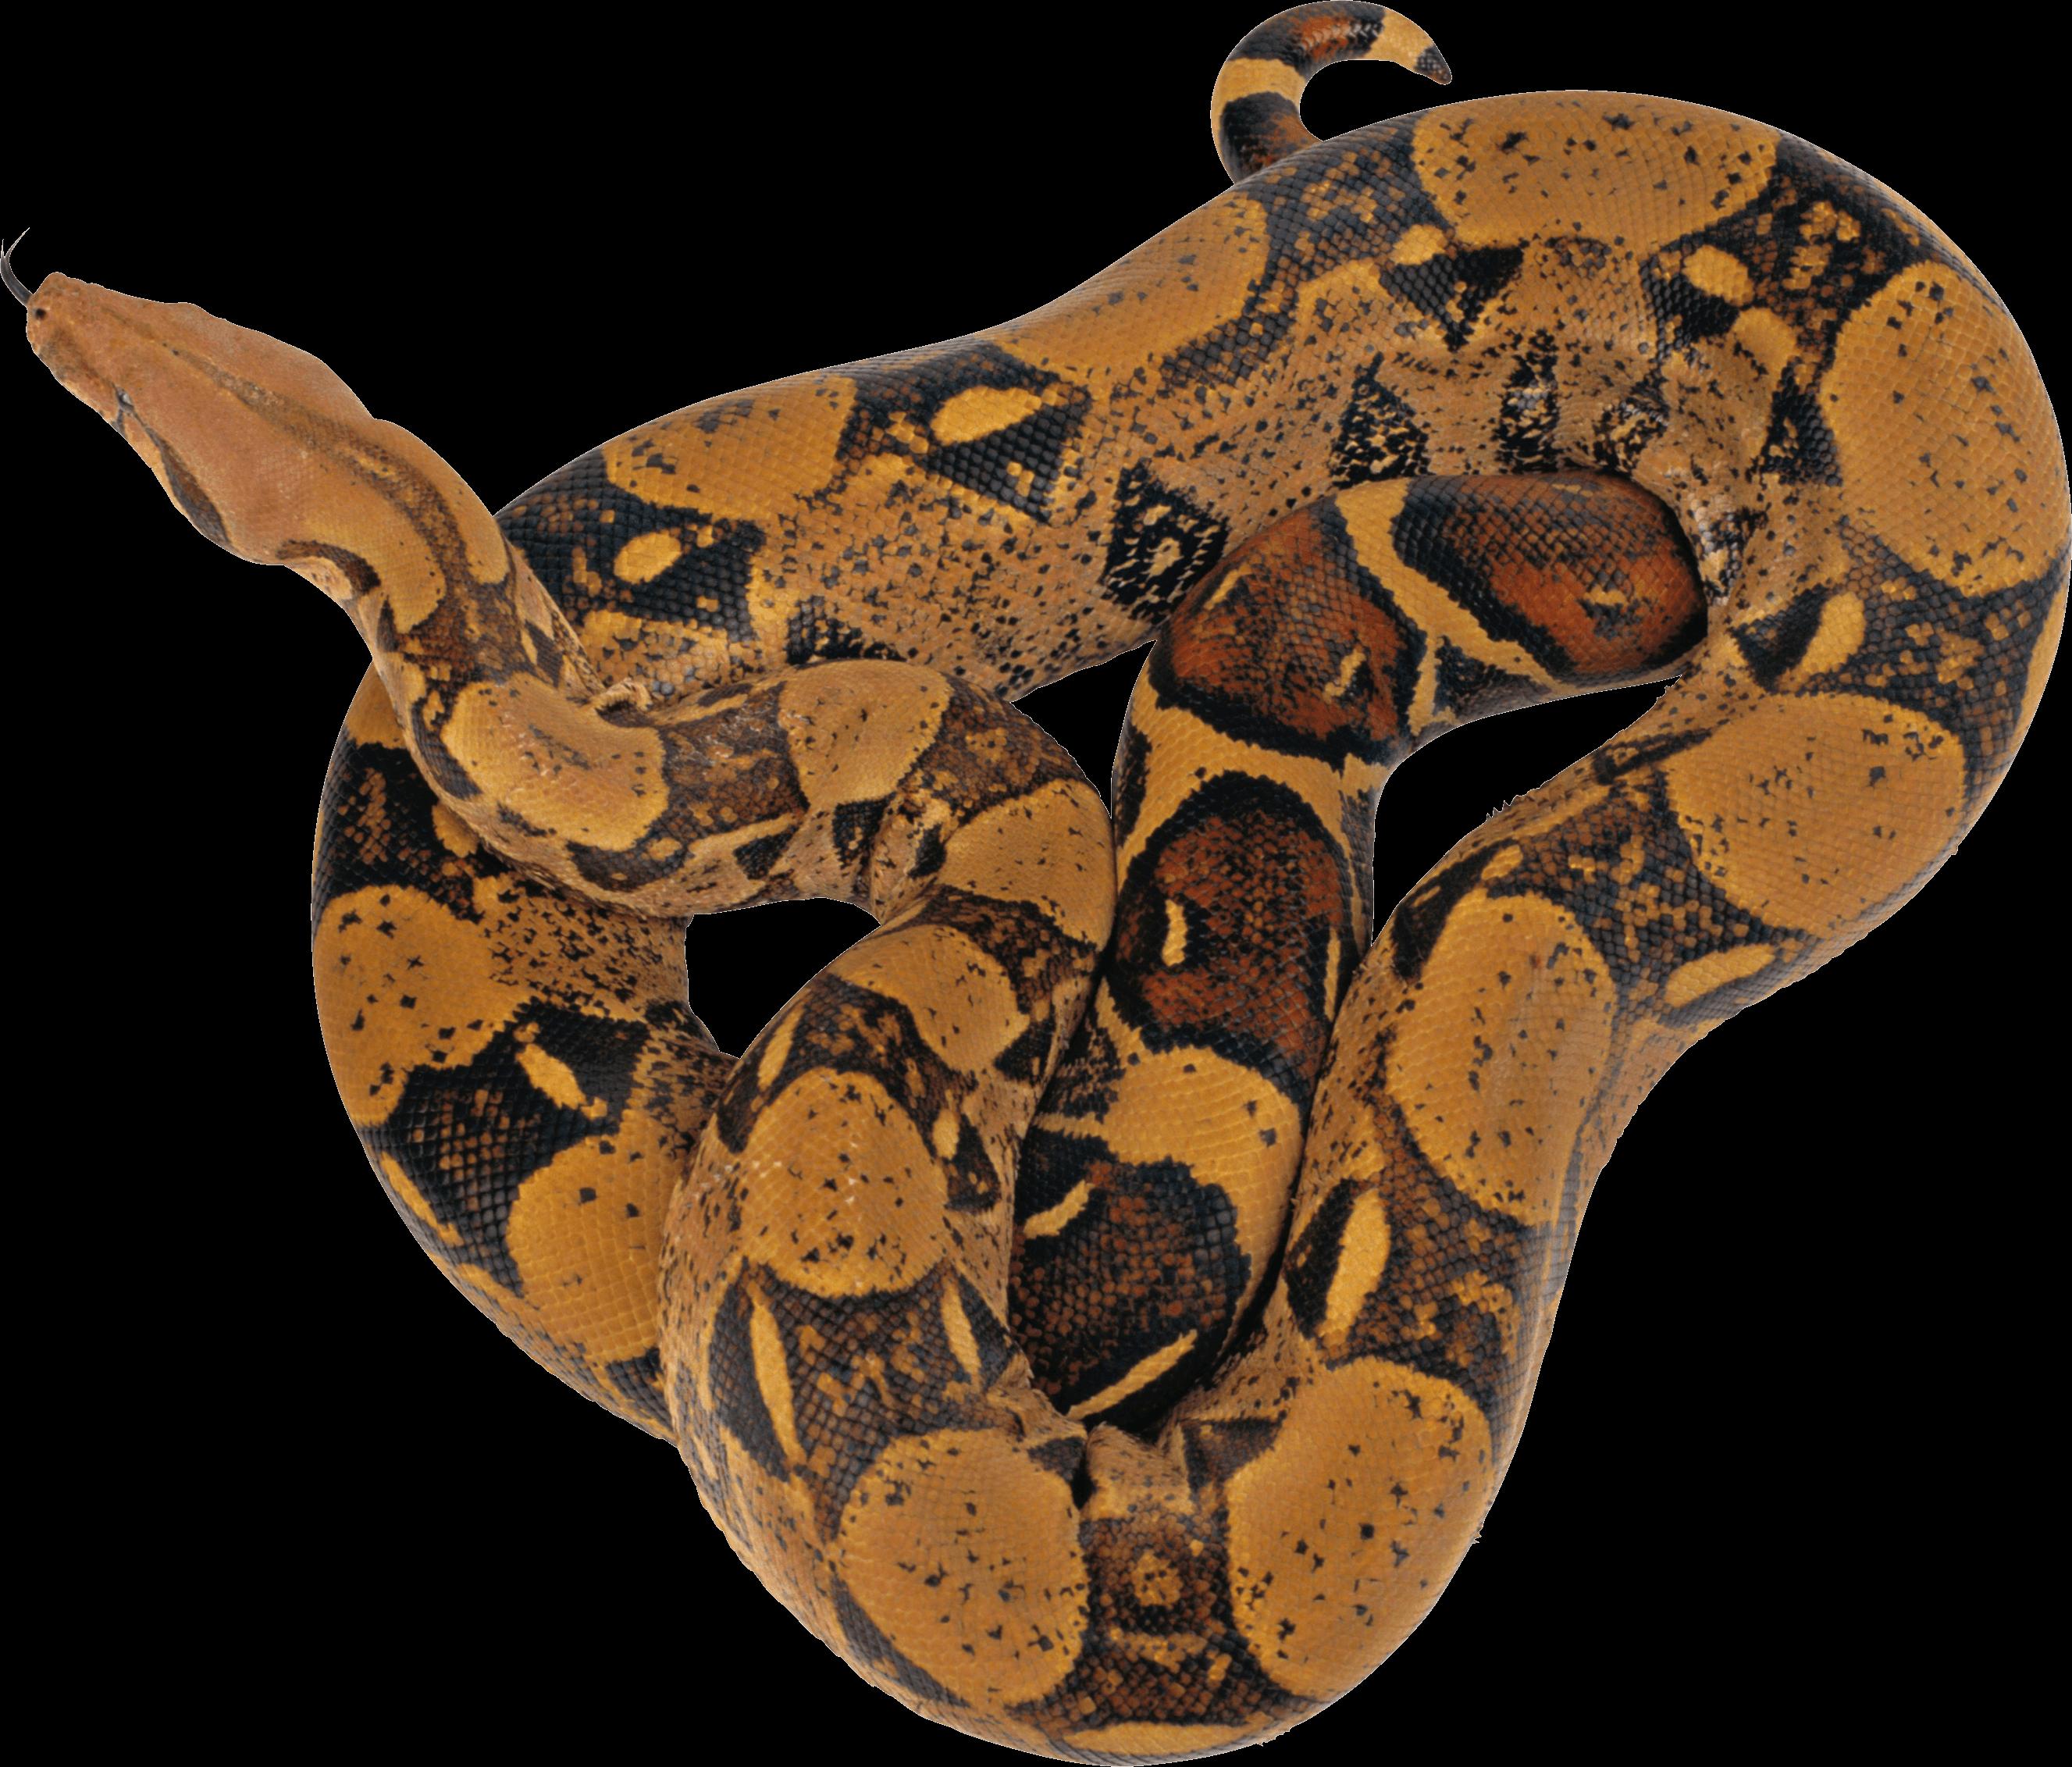 Python Snake Png - Download Png Image   Snake Png Image Picture Download, Transparent background PNG HD thumbnail